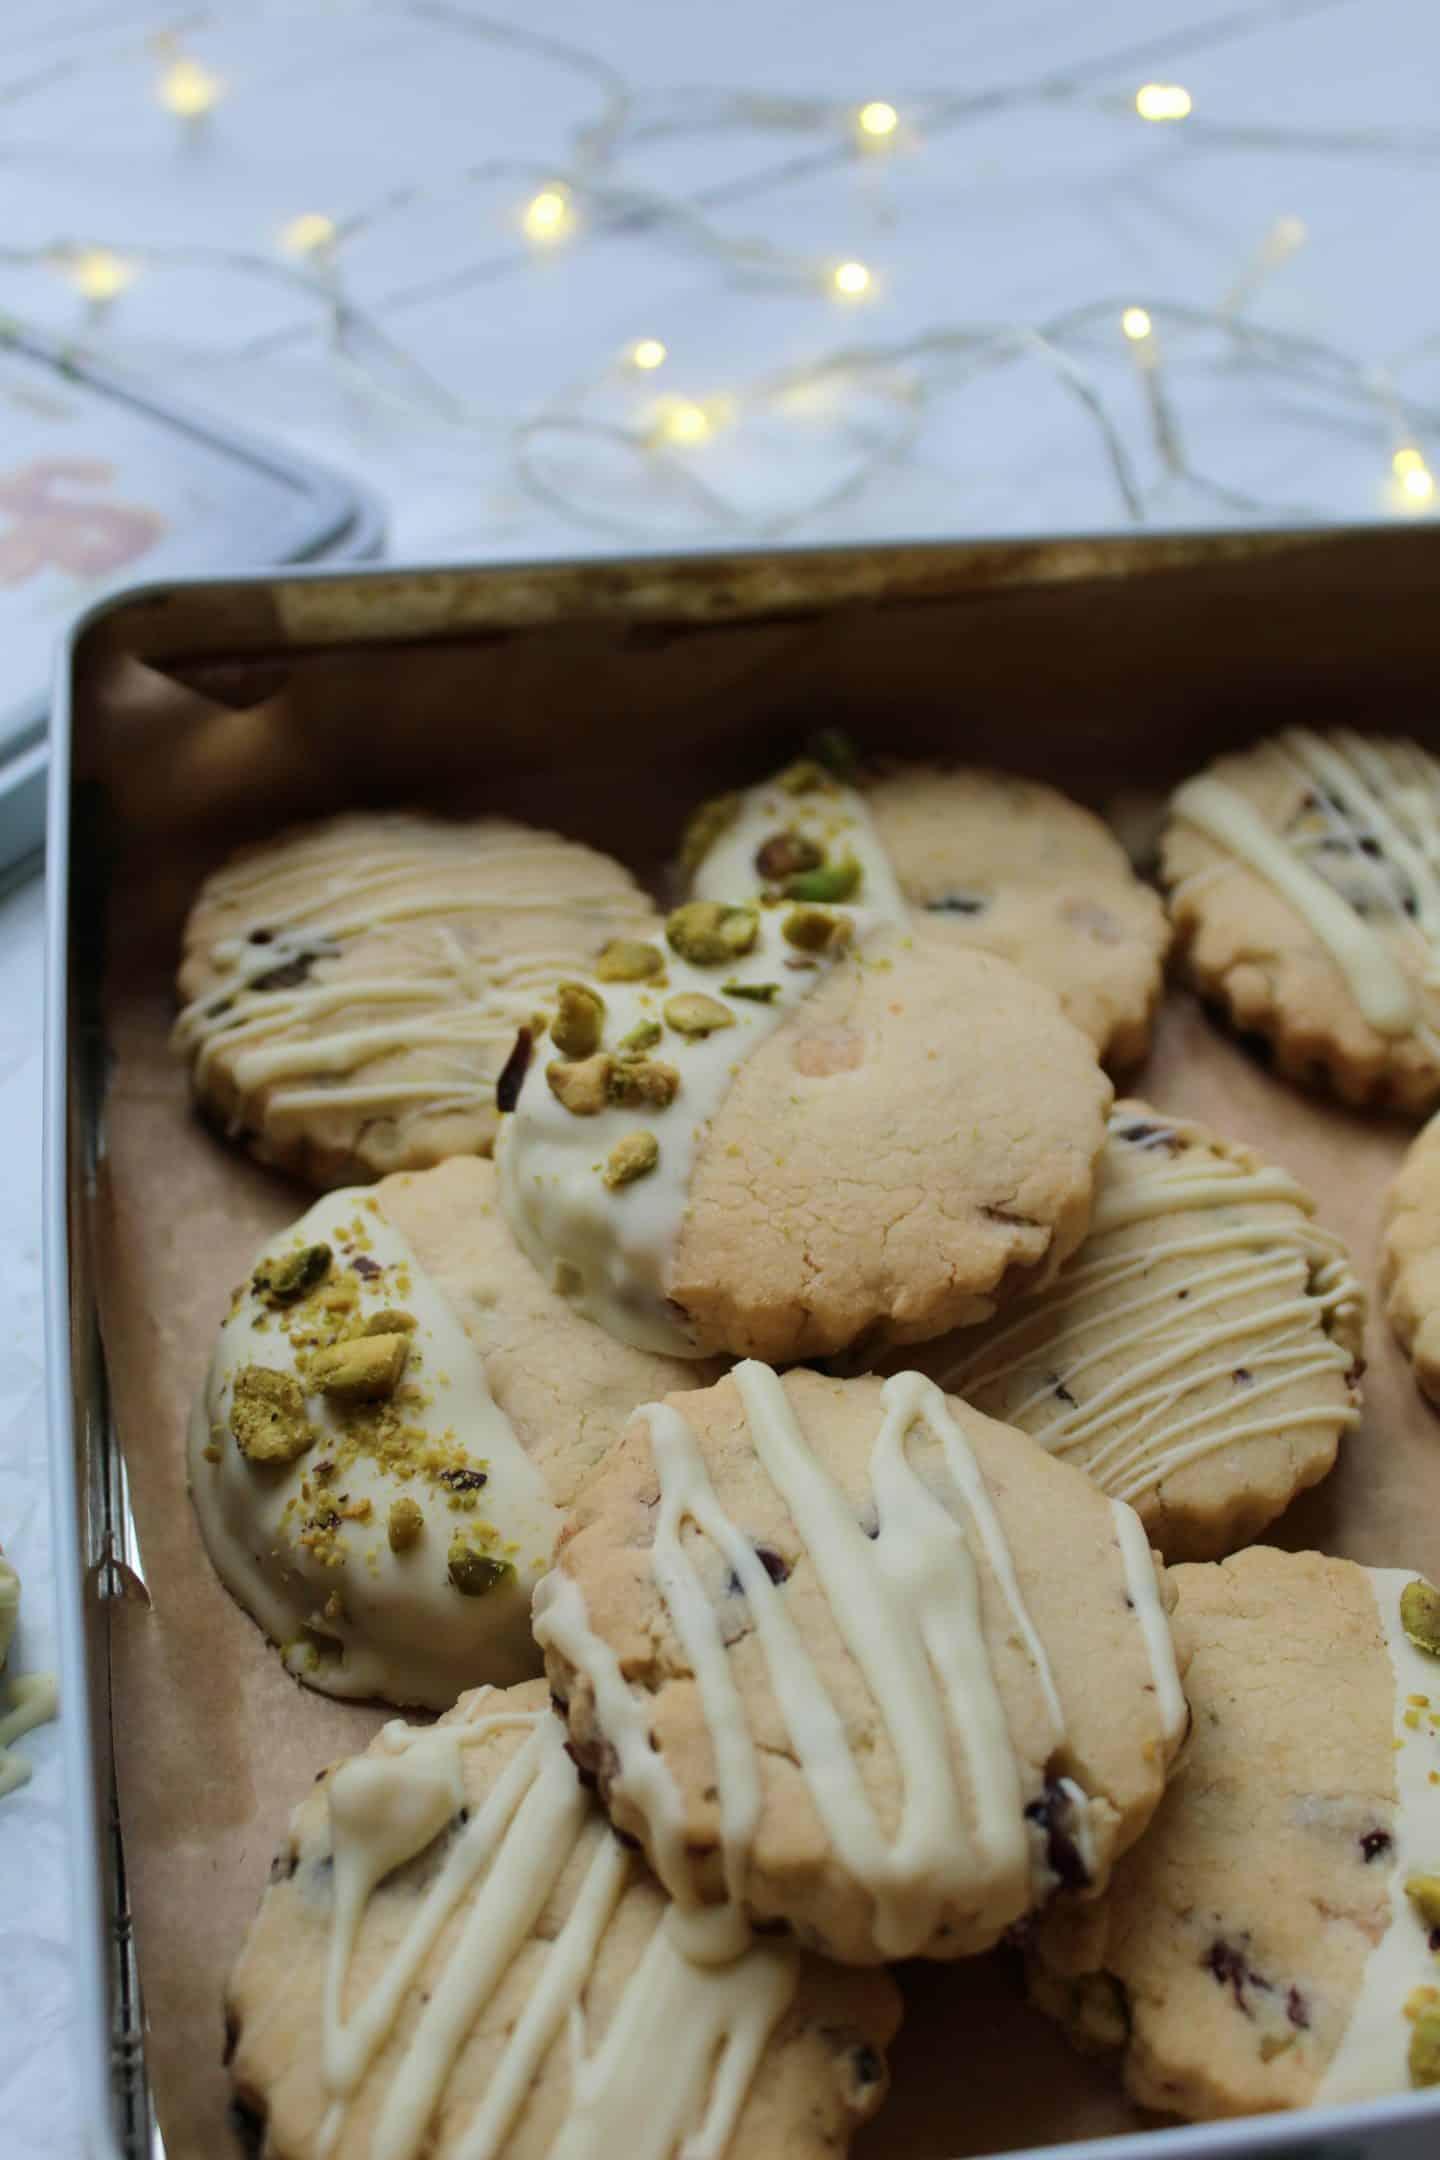 gluten free shortbread recipe with white chocolate pistachio cranberry